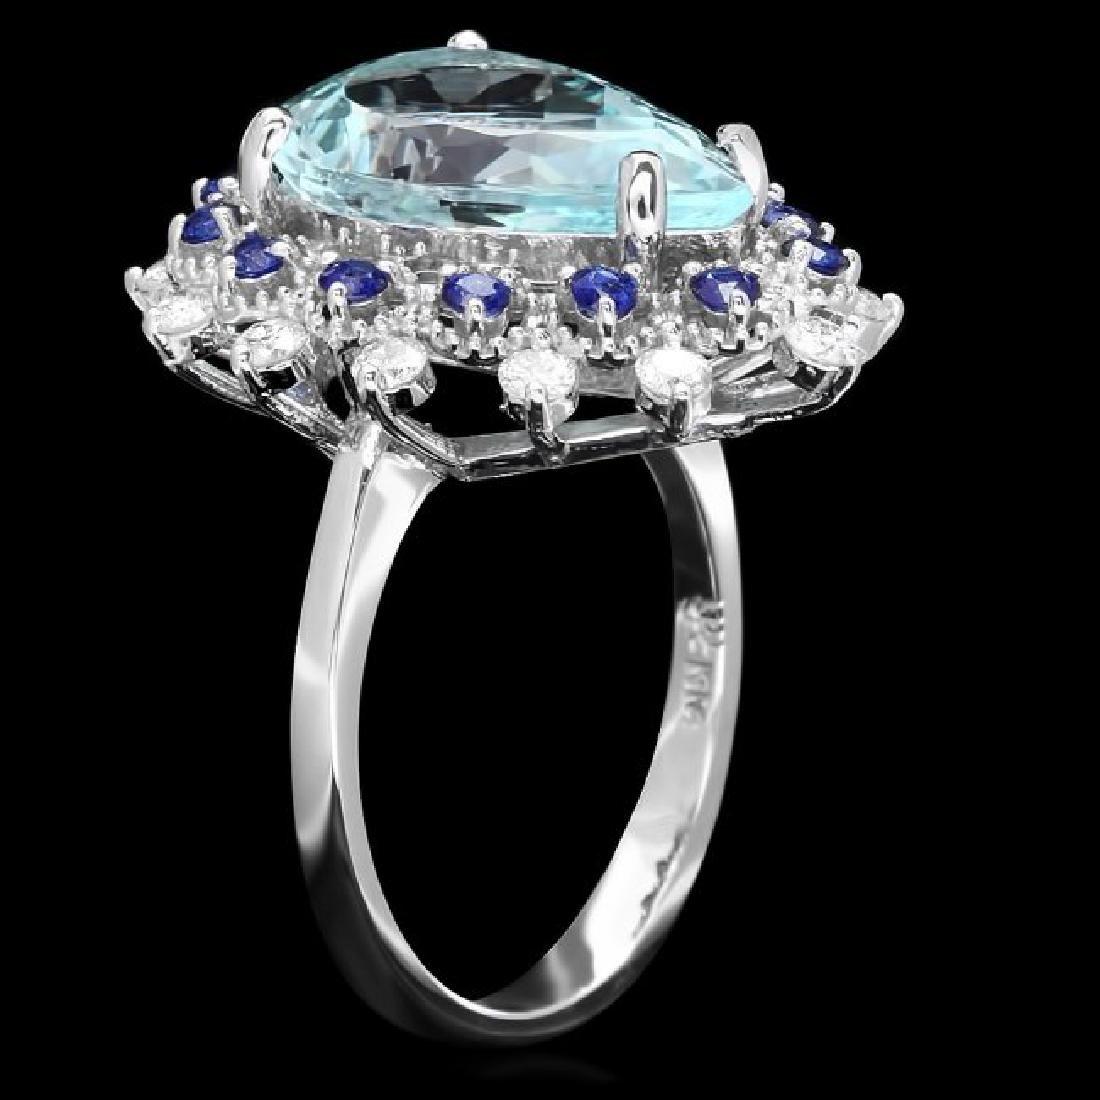 14k Gold 5.50ct Aquamarine 0.55ct Diamond Ring - 2